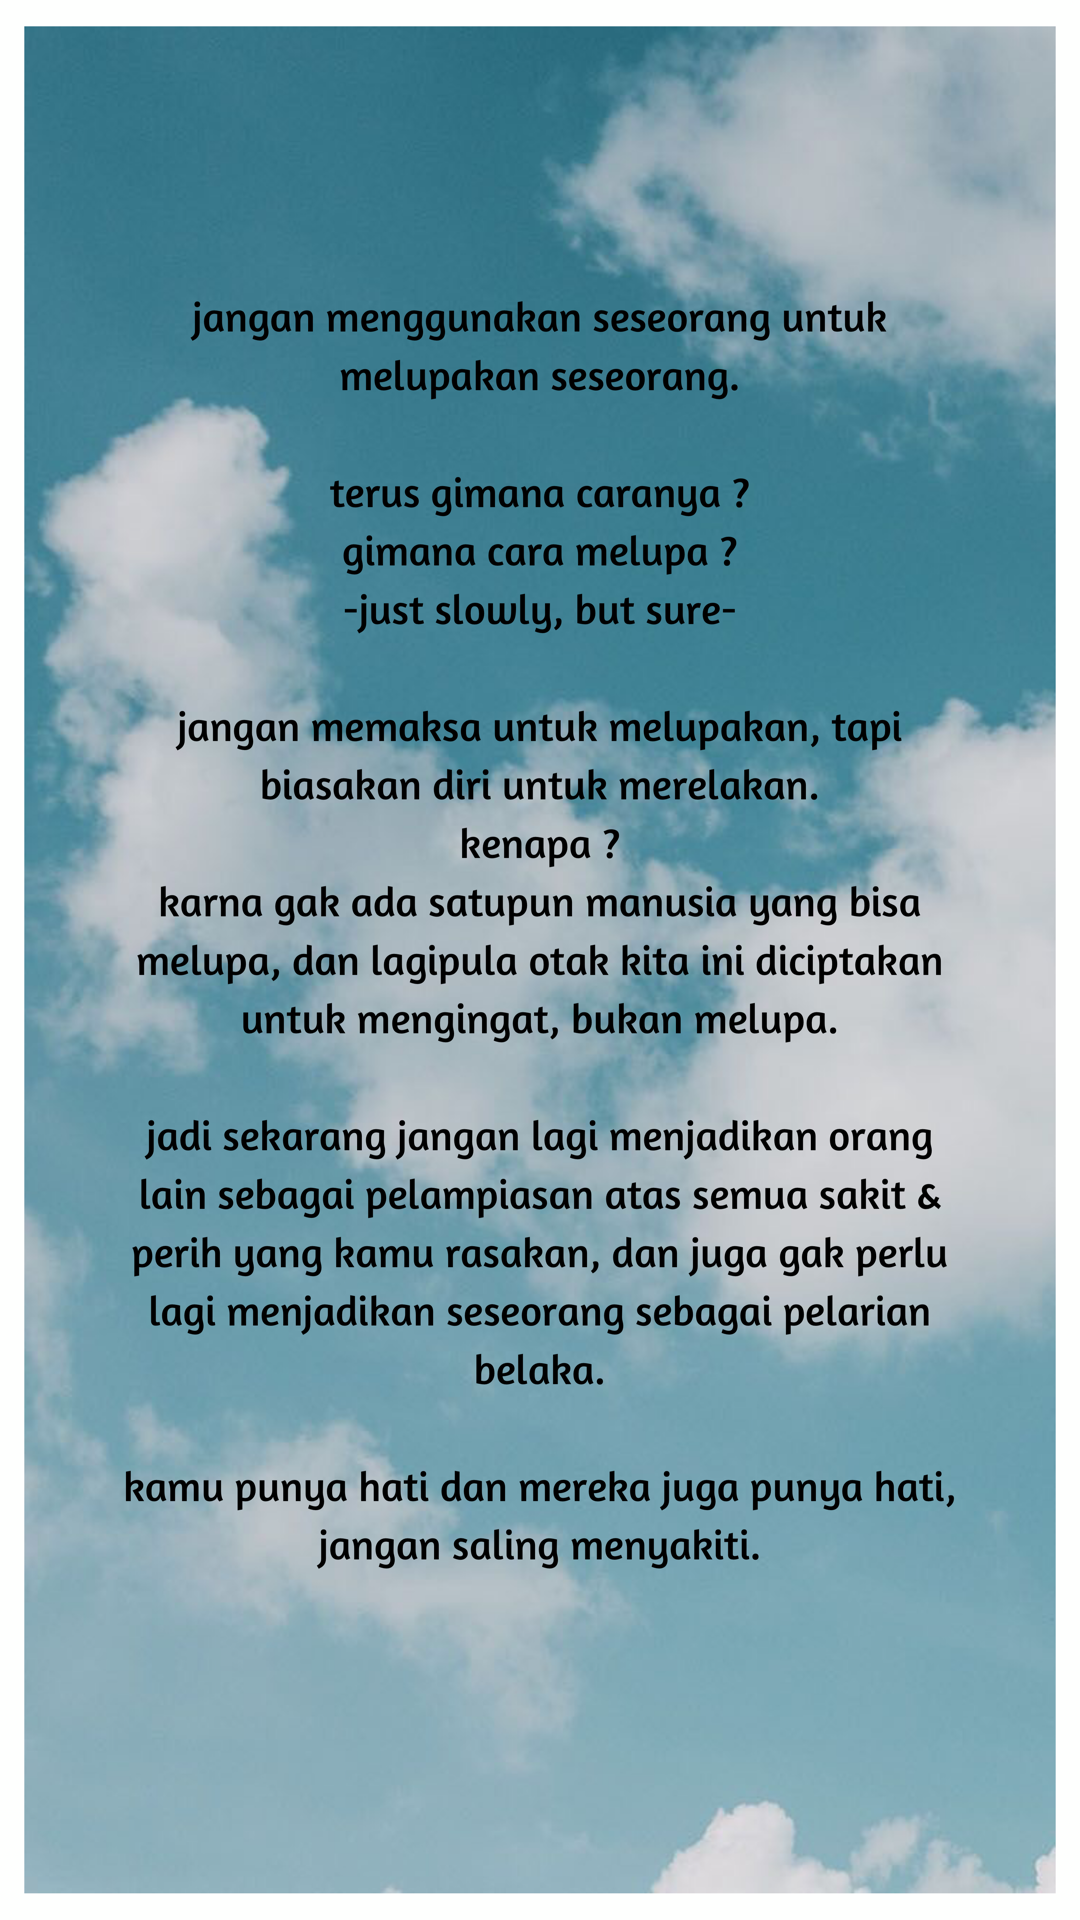 Puisi Melupakan Seseorang : puisi, melupakan, seseorang, Quotes, Kata-kata, Indah,, Motivasi,, Kutipan, Pelajaran, Hidup